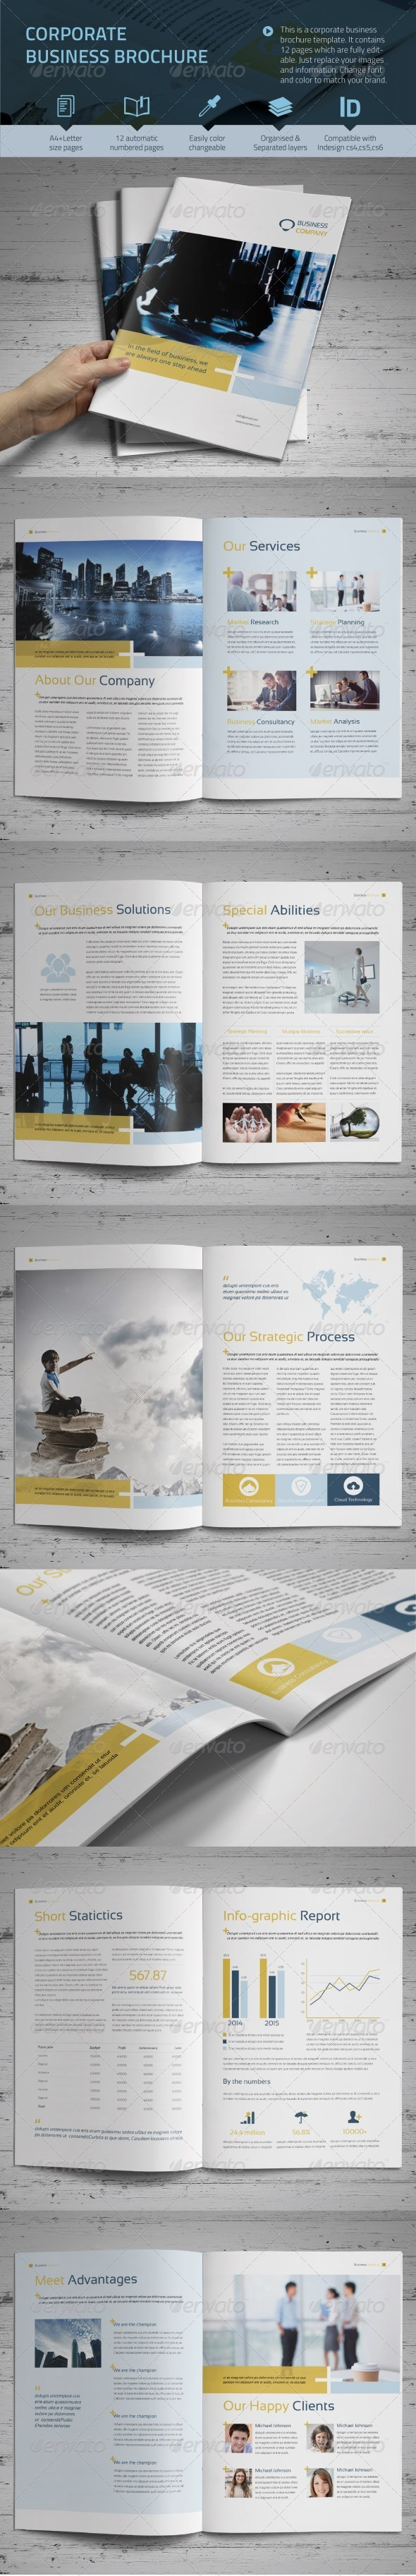 GraphicRiver Corporate Business Brochure vol.2 8686986